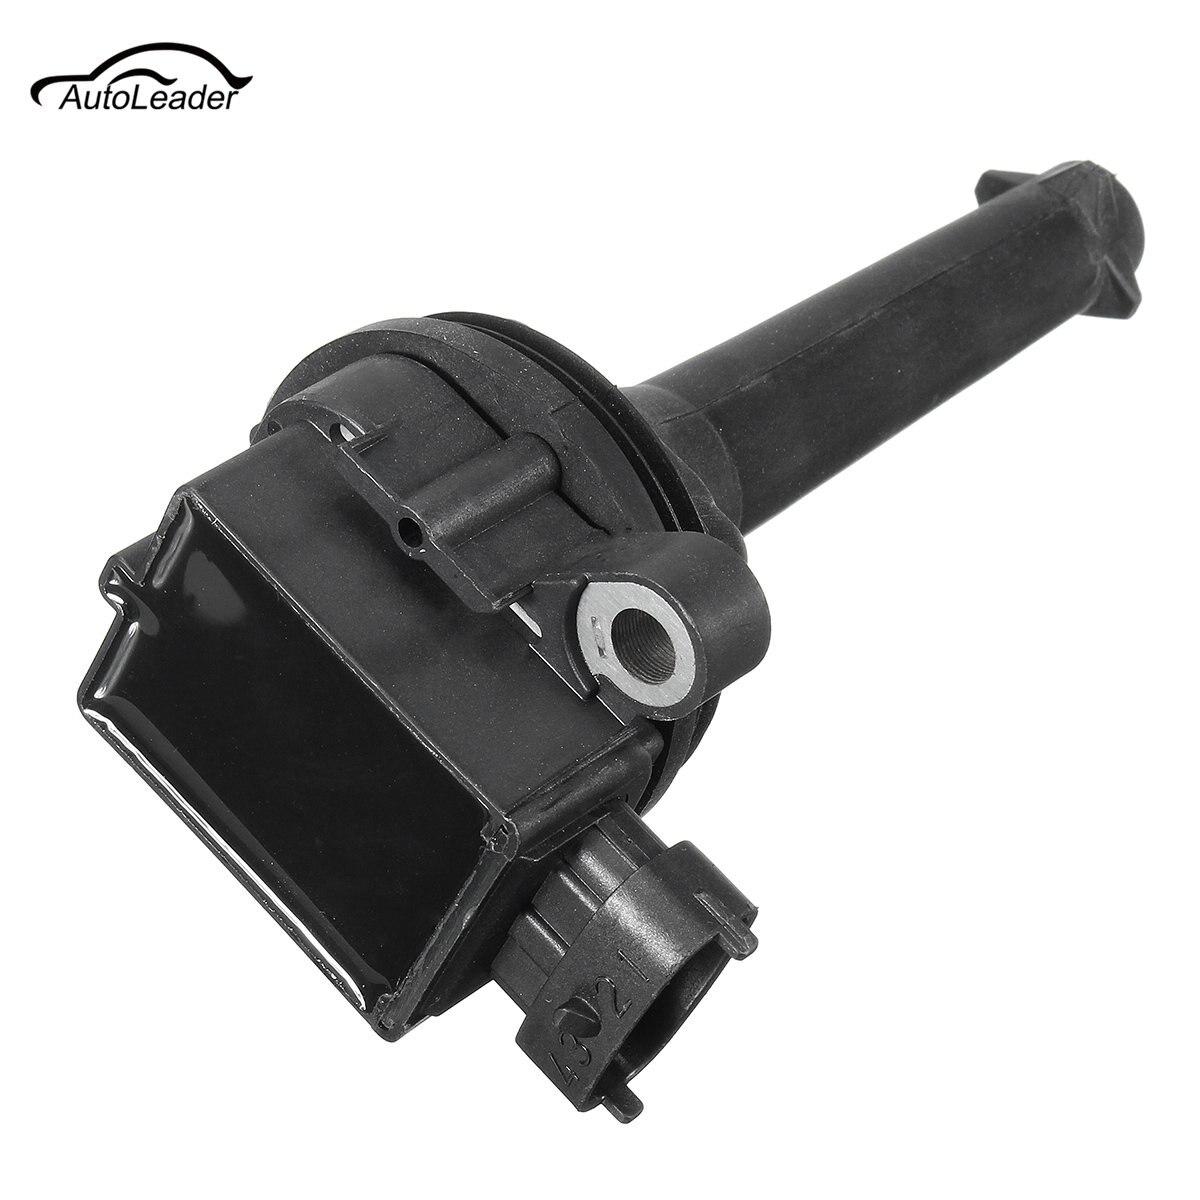 New Black Ignition Coil For Volvo 1999-2013 XC70 XC90 C70 S60 UF341 9125601 Polybutylene Terephthalate